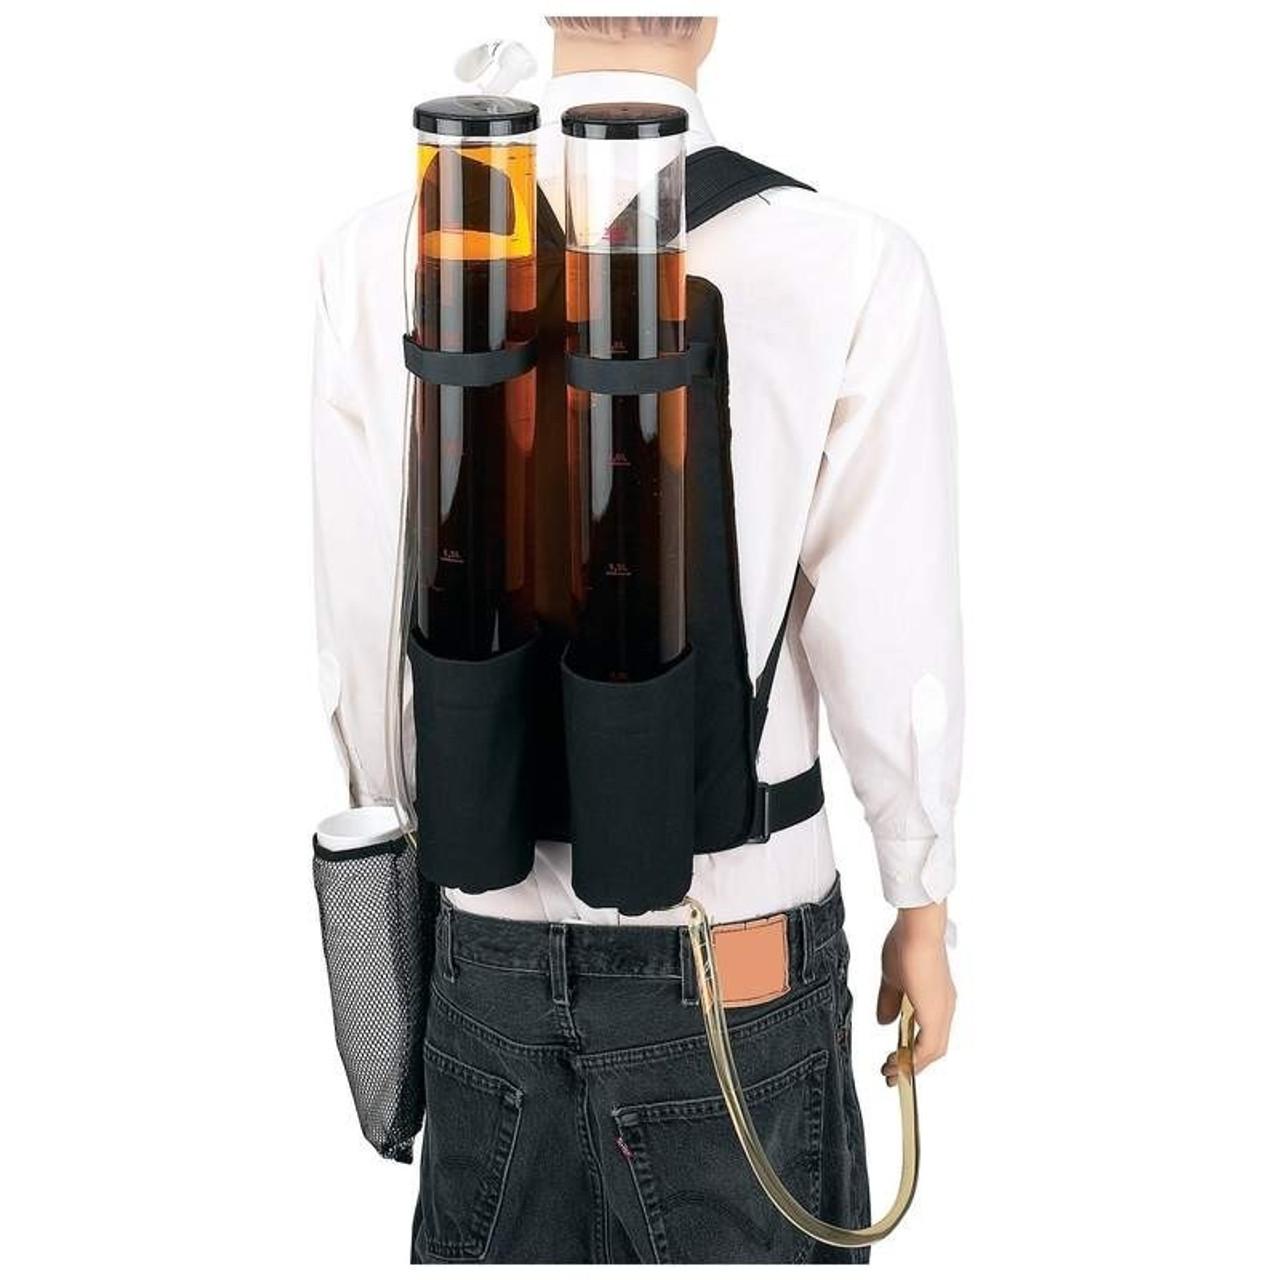 Dual Shot Back Pack Dispenser, Protable, Dual, Keg, Shot, Bar, Nightclub, Waiter, Bartender, Liquor, Pourer, Dispense, Mobil, Movil, double, dual, beer, ideas, summer, pool party, beach, cruise